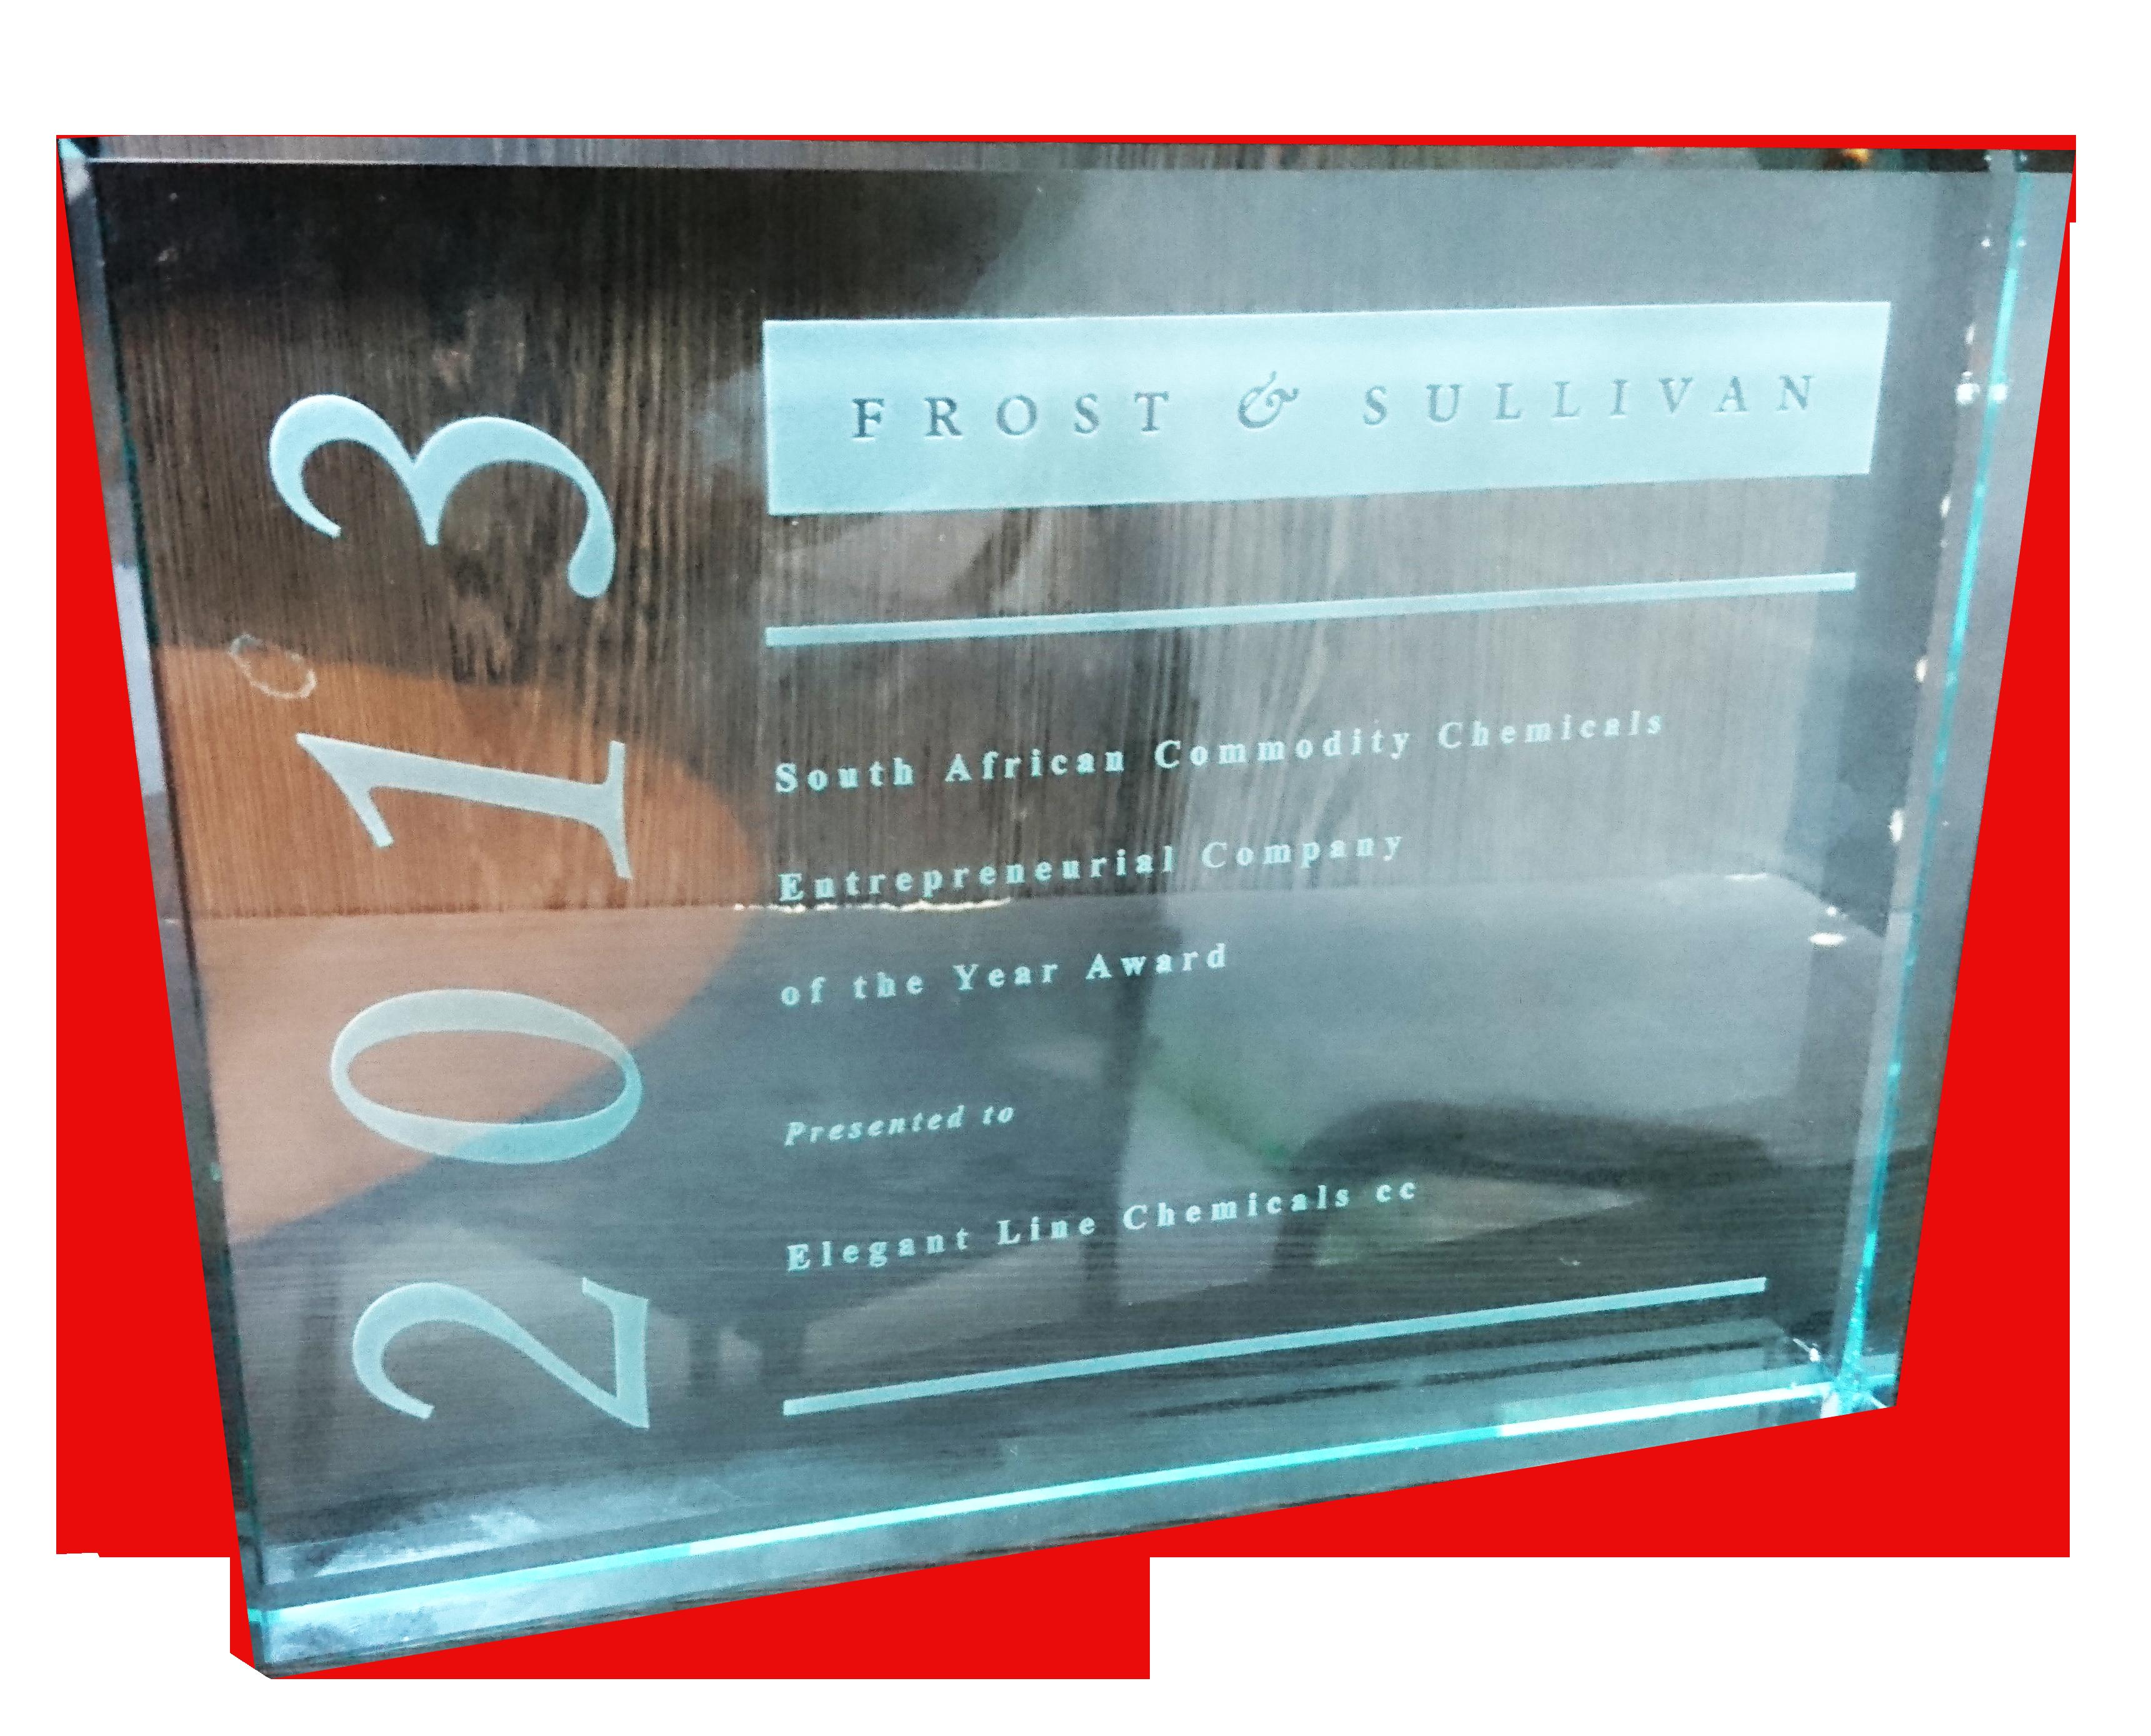 Frost & Sullivan Award in 2013